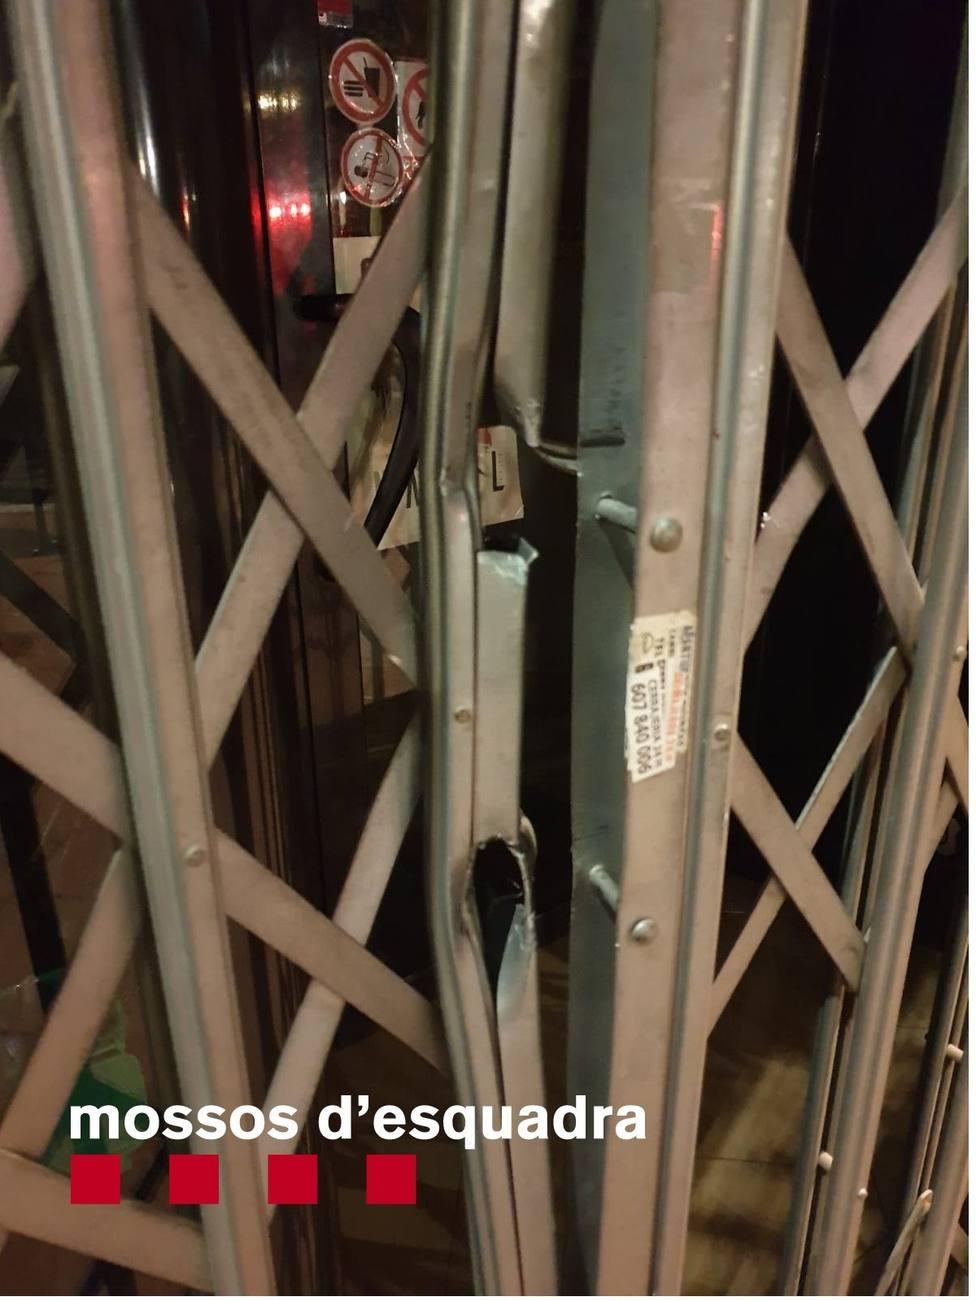 Tres detenidos por intentar robar en una tienda de Barberà del Vallès